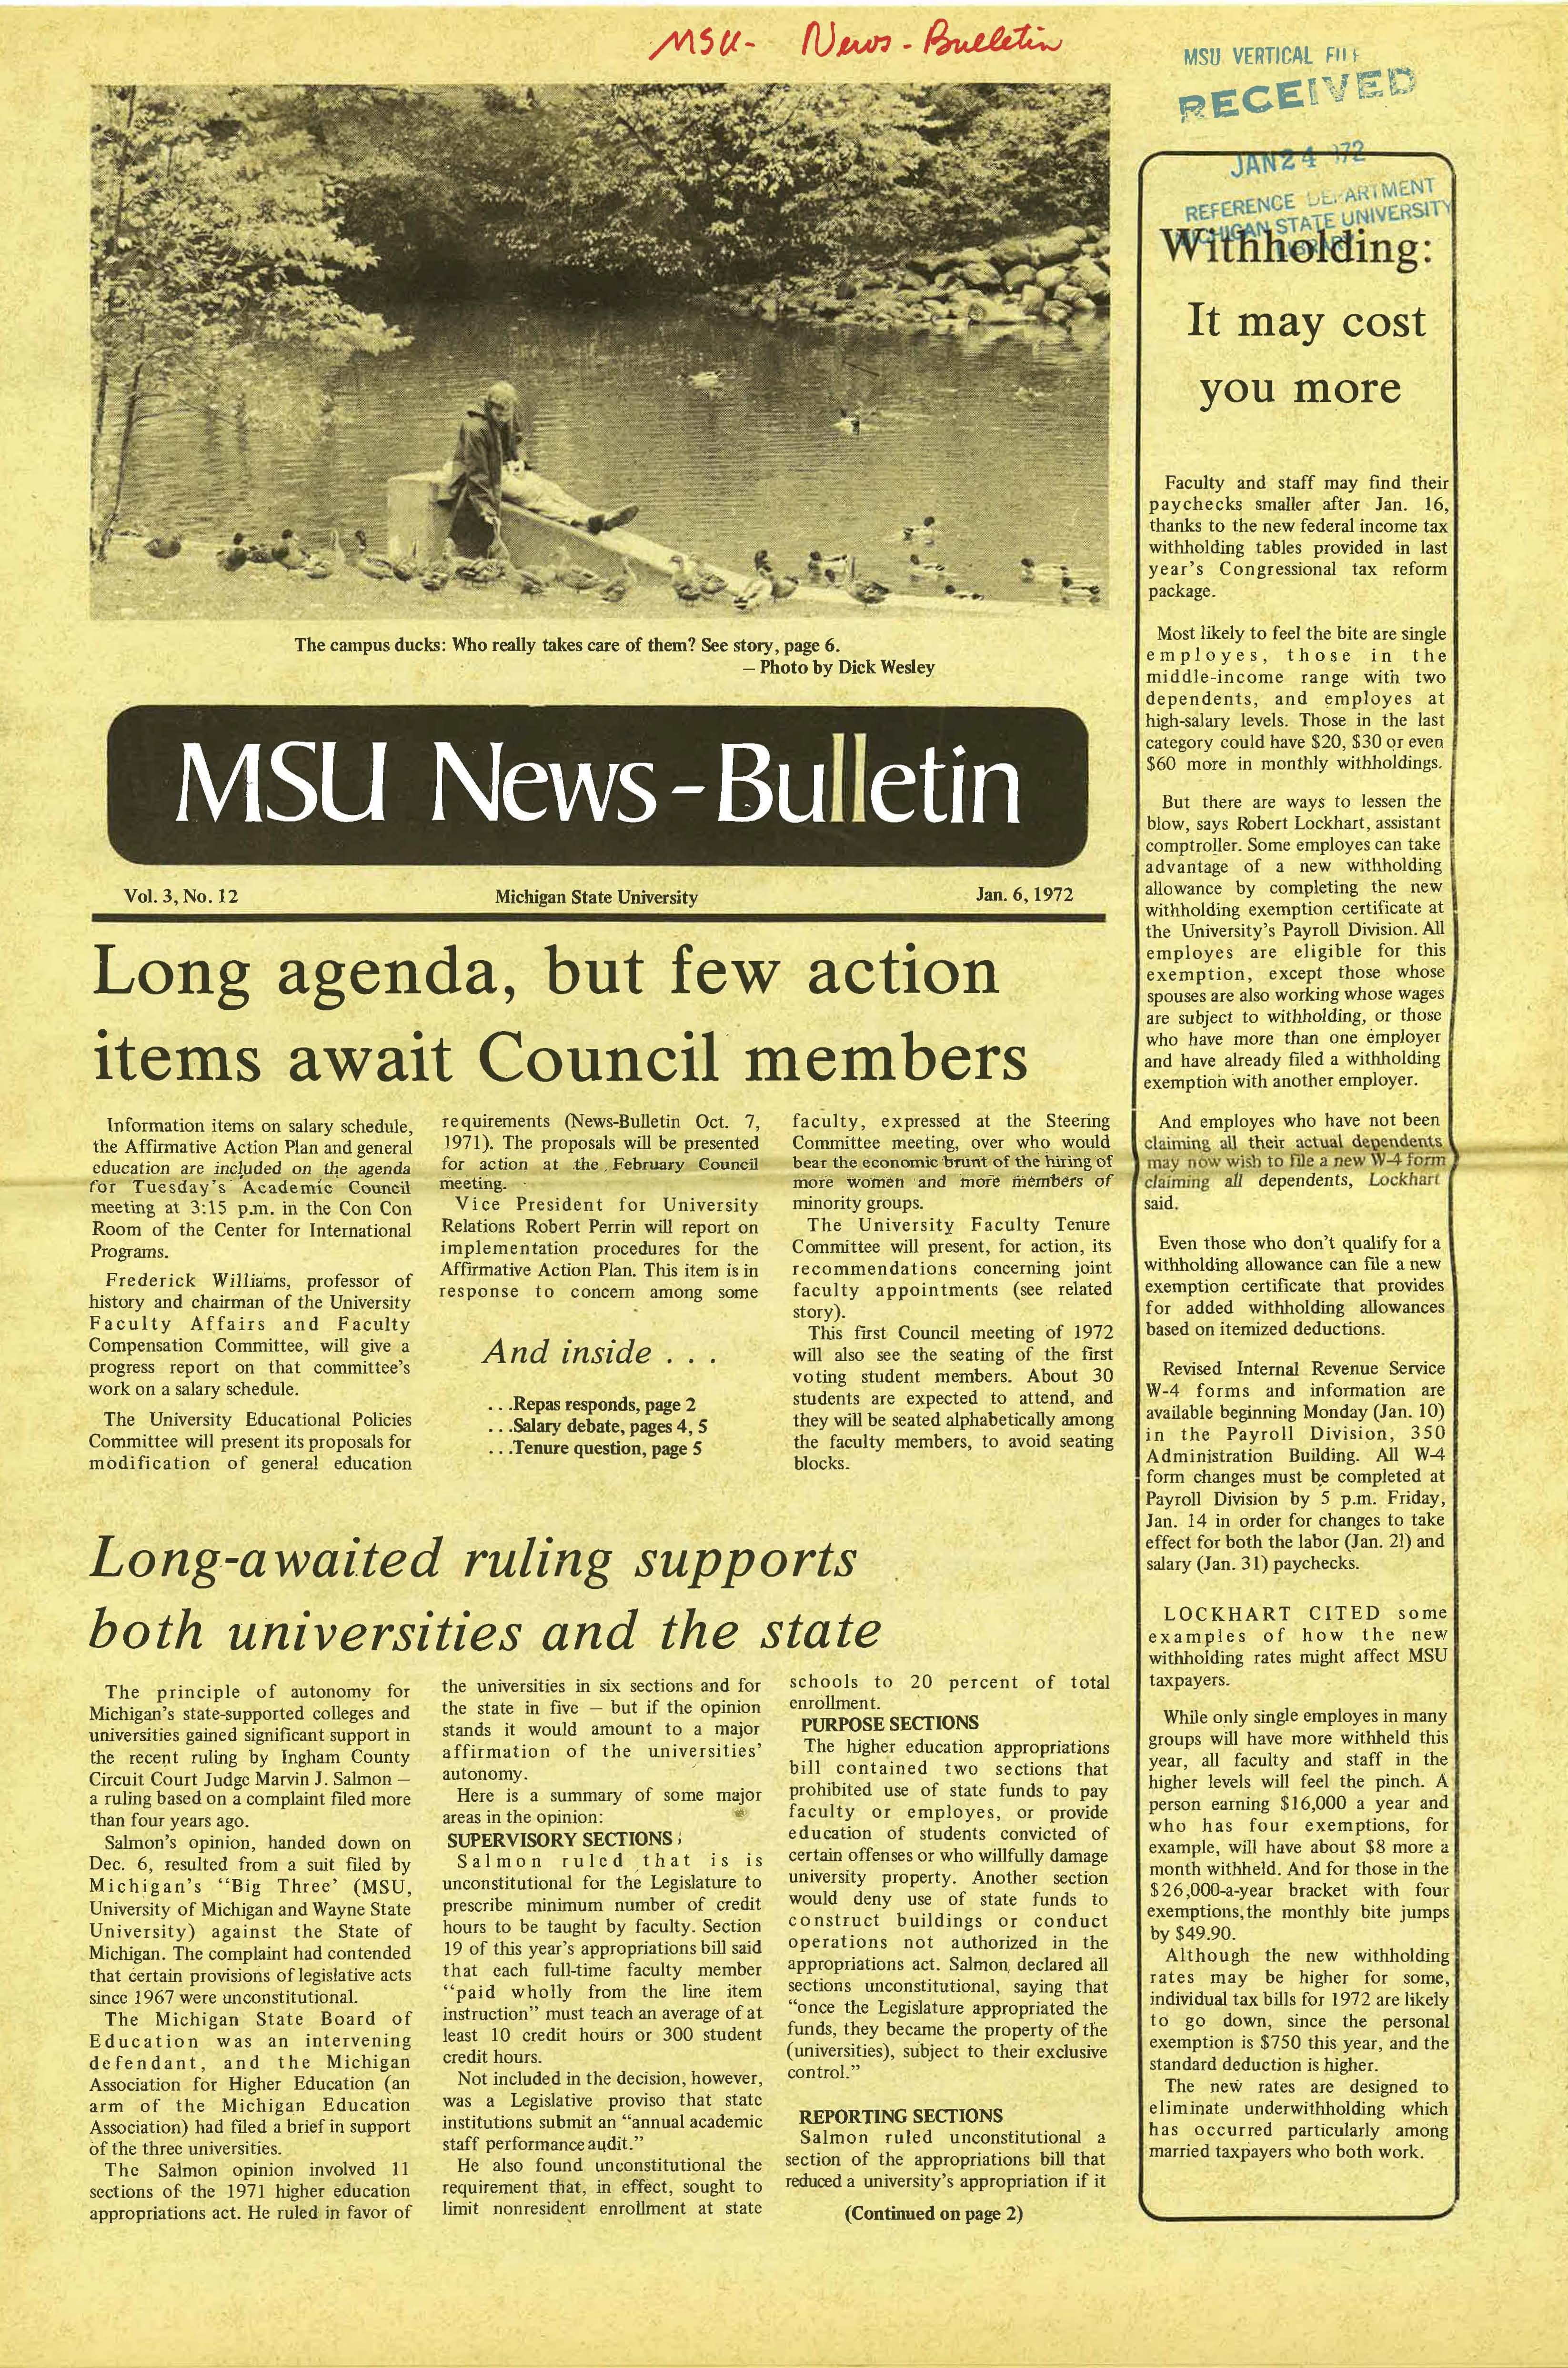 MSU News Bulletin, vol. 3, No. 34, July 13, 1972